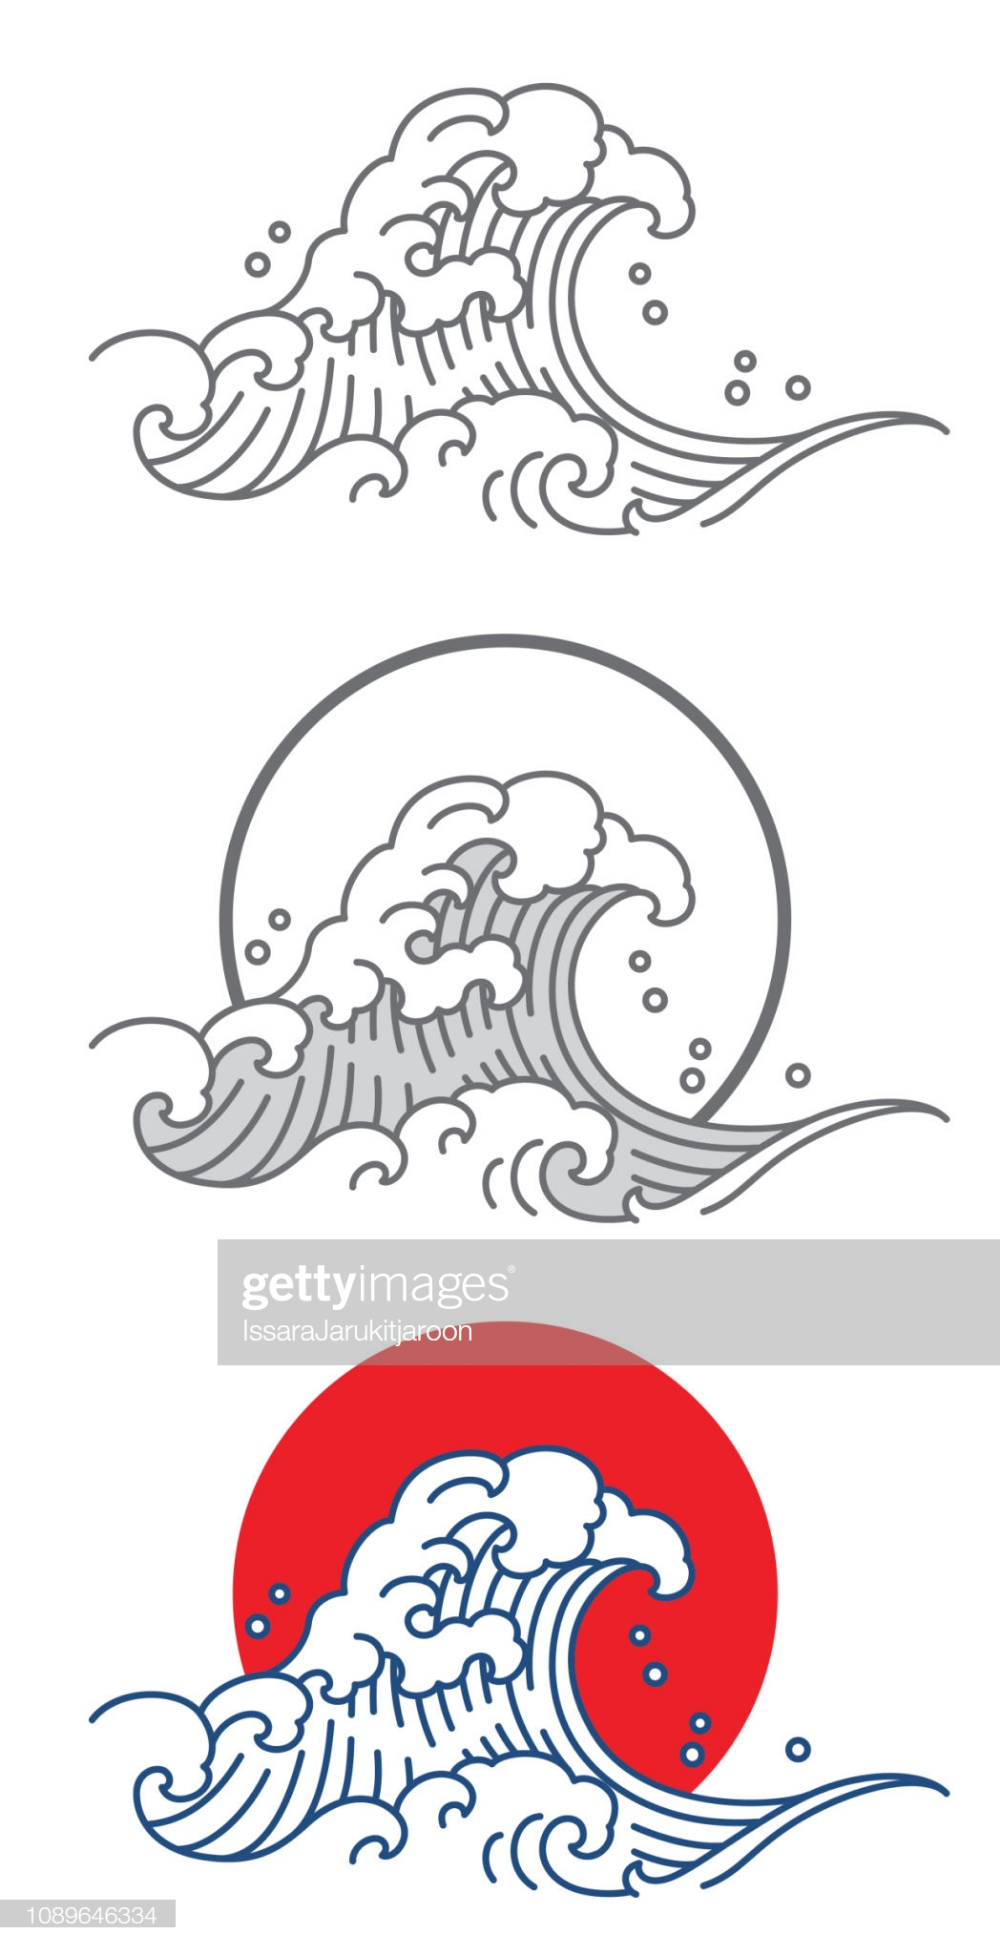 Big wave ocean vector icon. Thai. Japan. Outline & fill